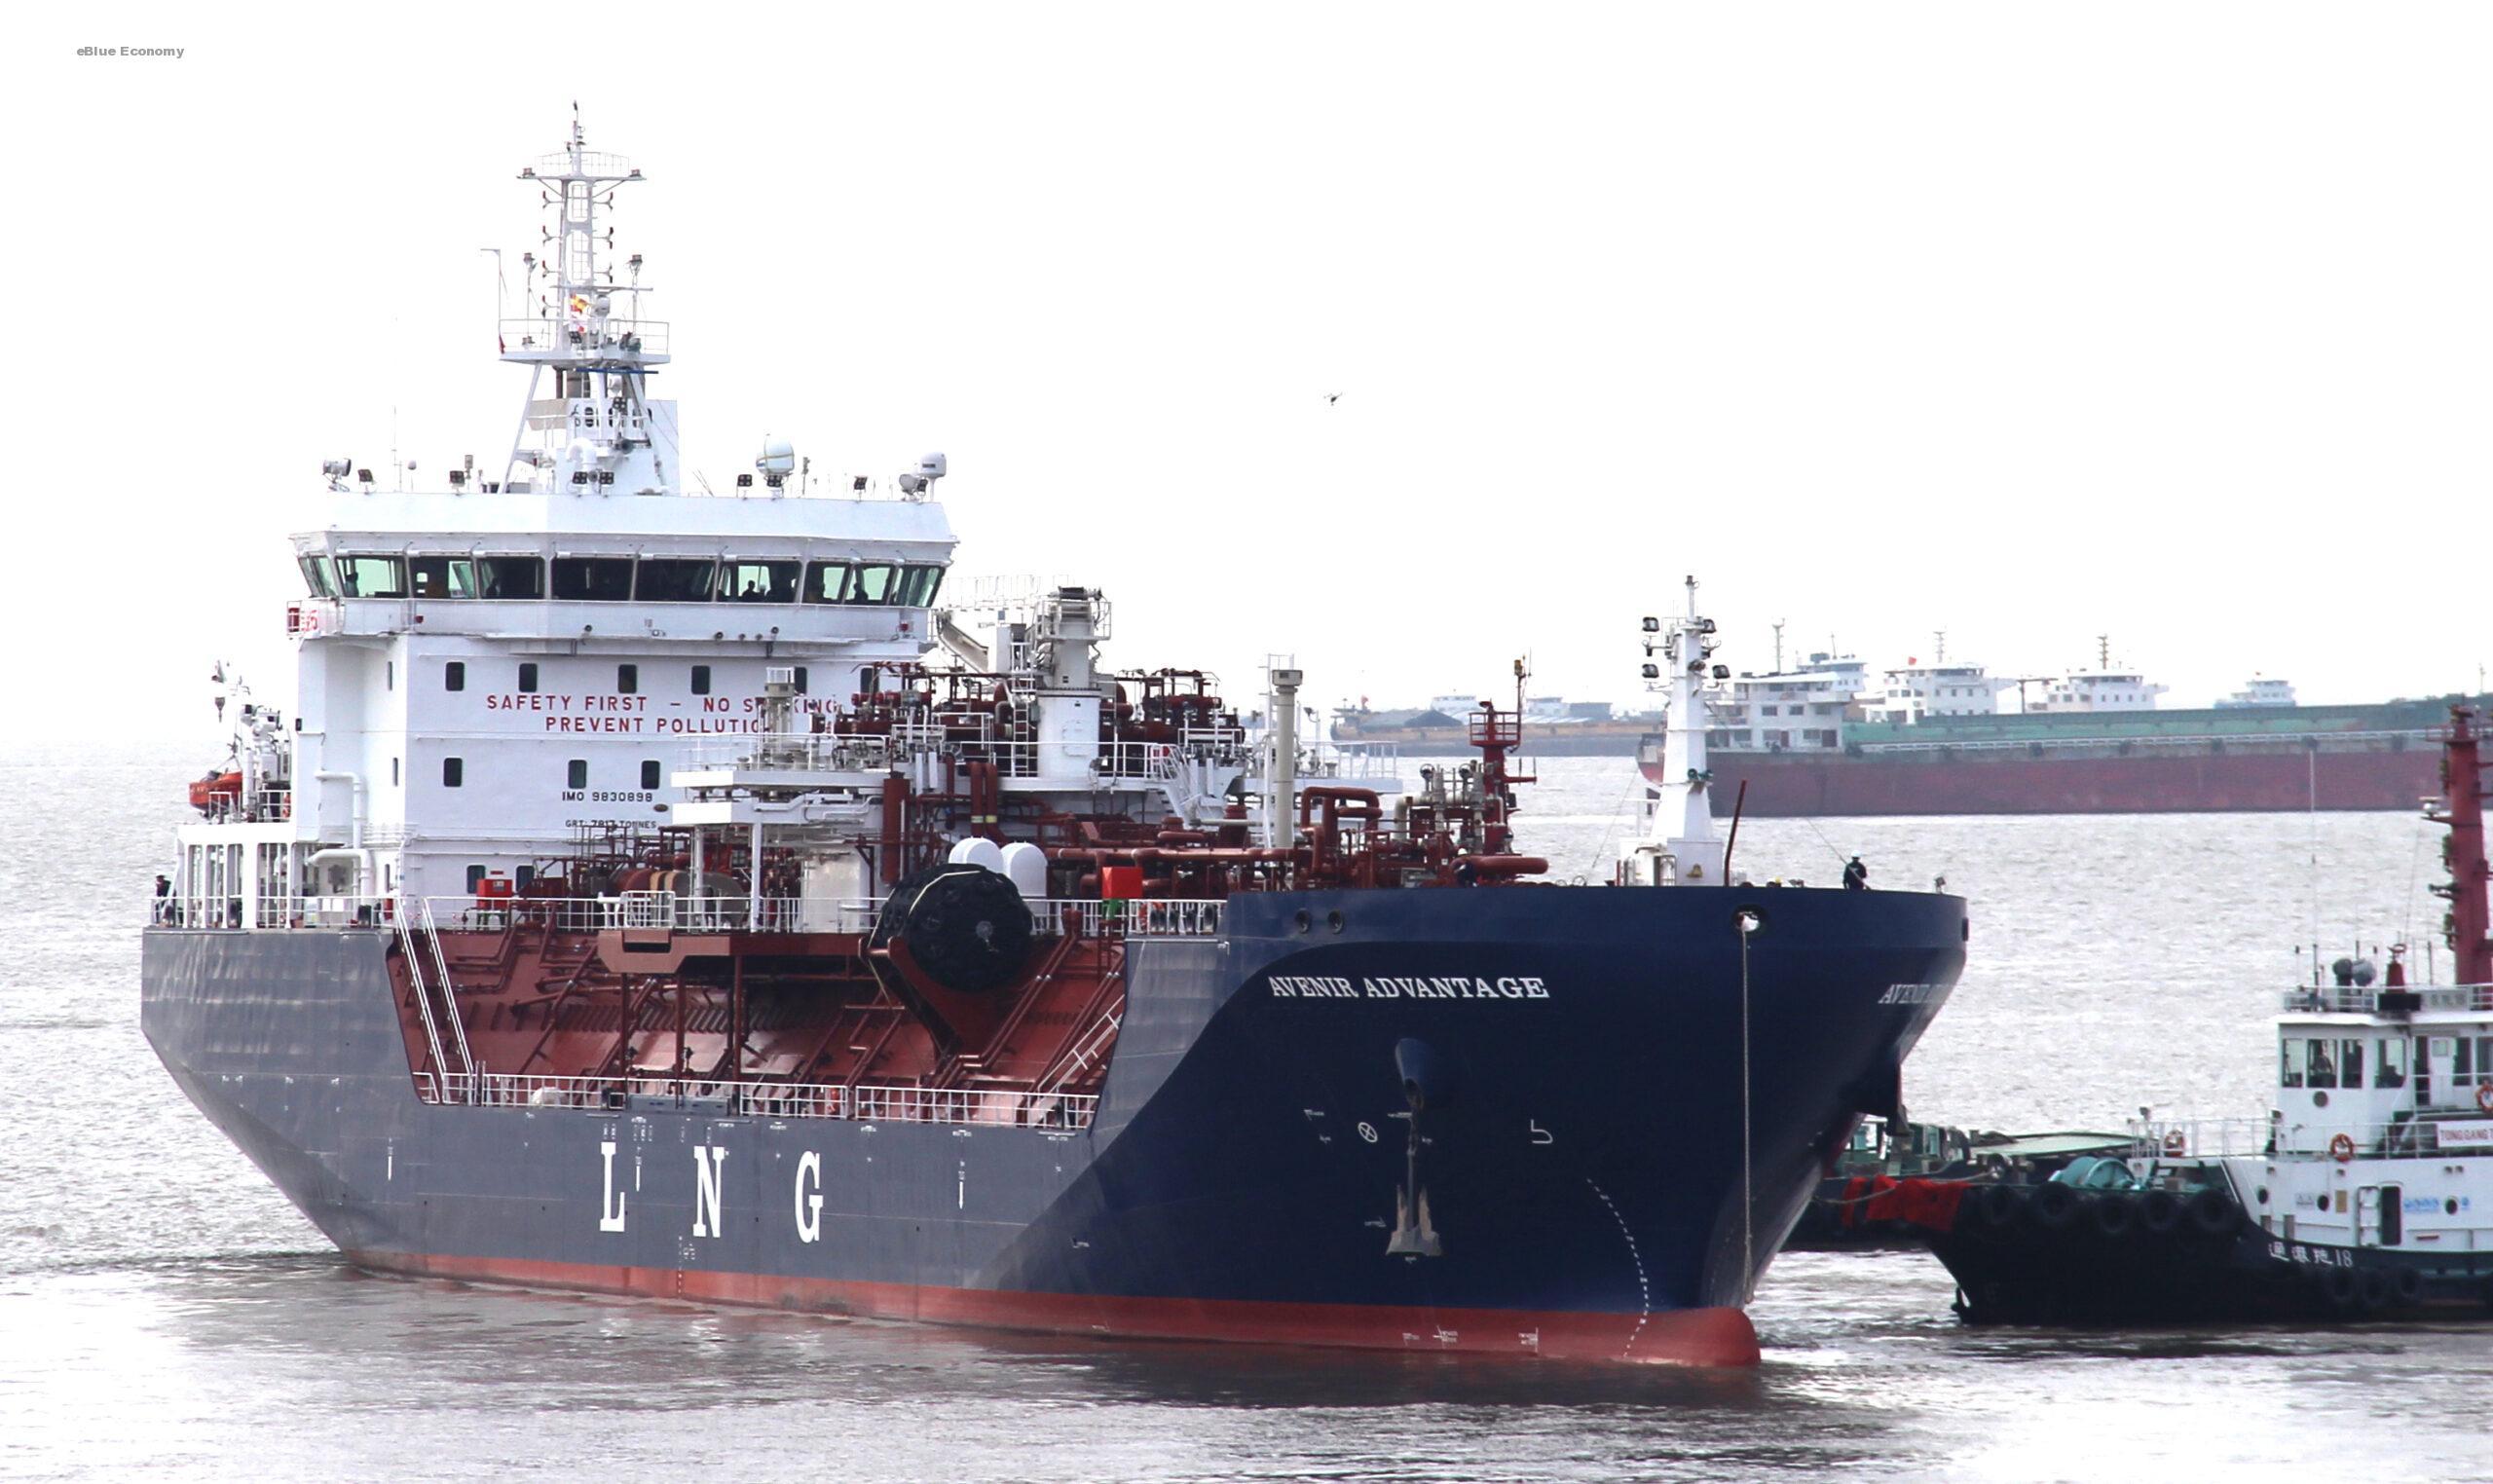 eBlue_economy_LNG-bunkering-vessel